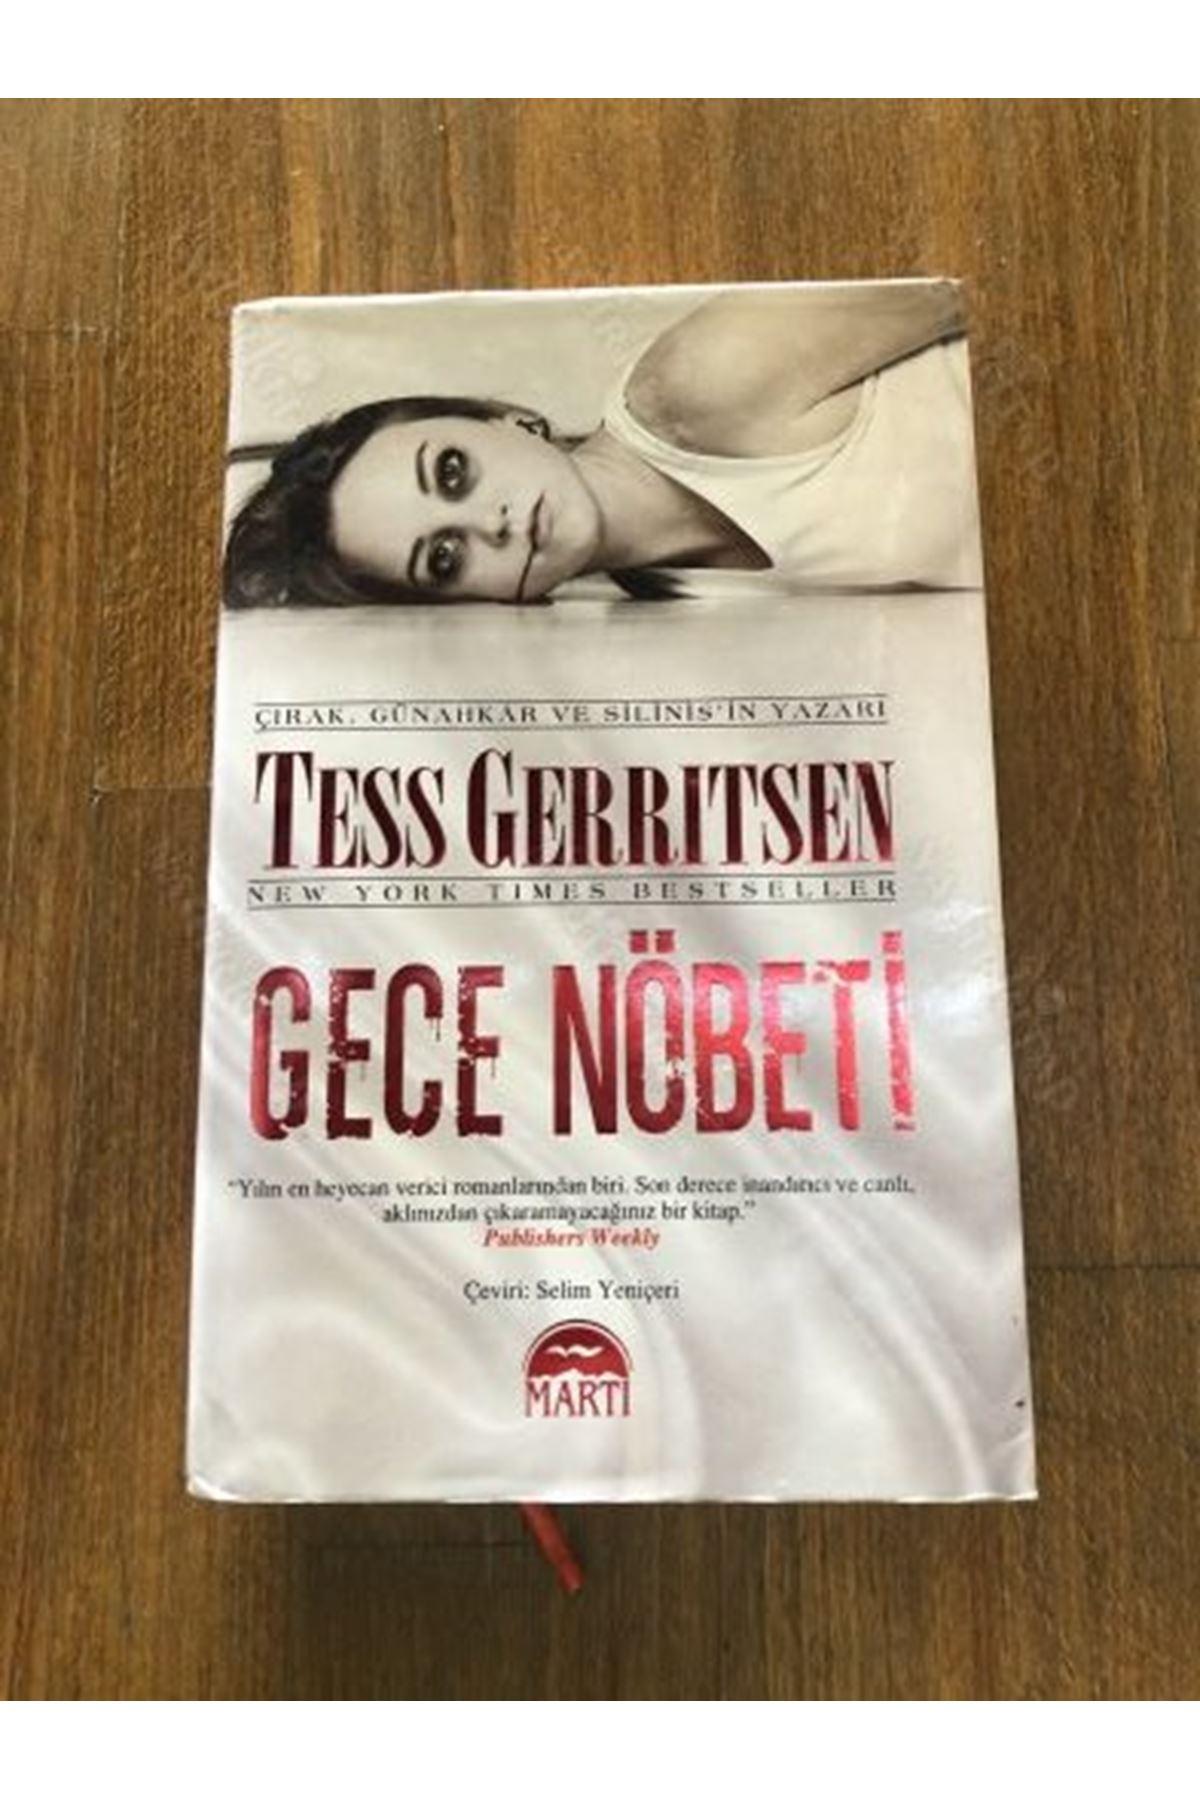 TESS GERRITSEN - GECE NÖBETİ